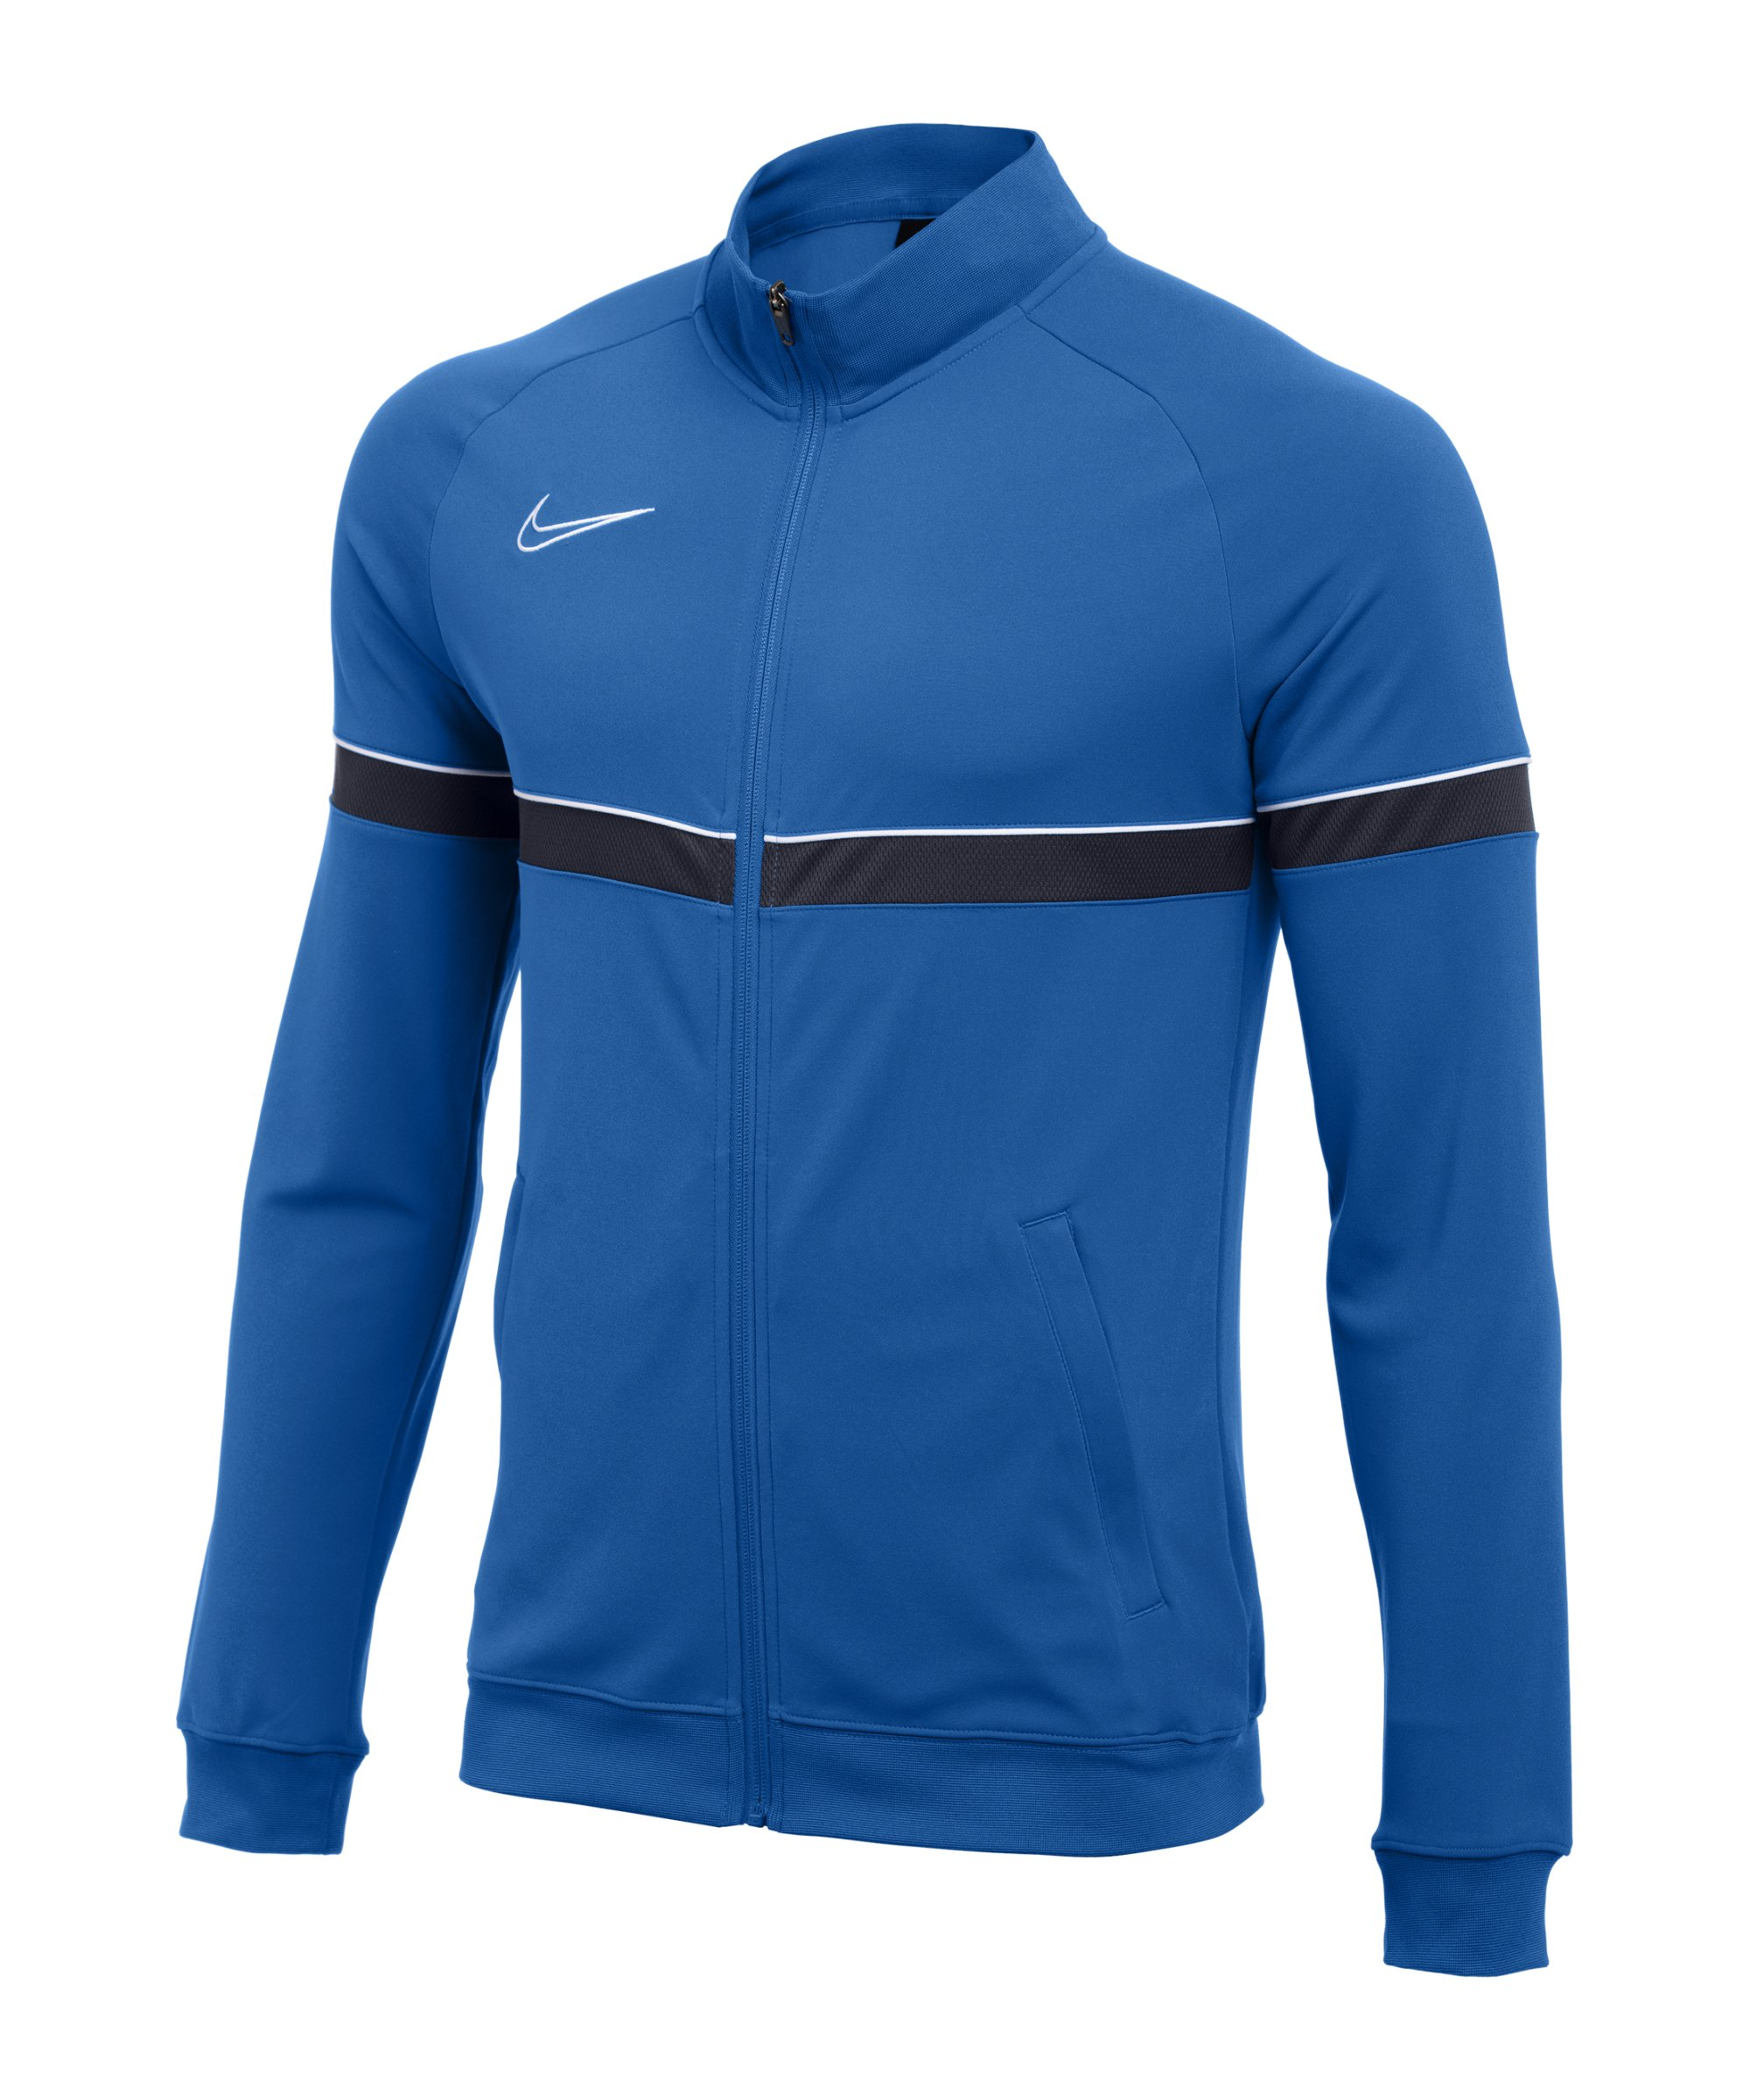 Nike Academy 21 Knit Trainingsjacke Kids Blau F463 - blau